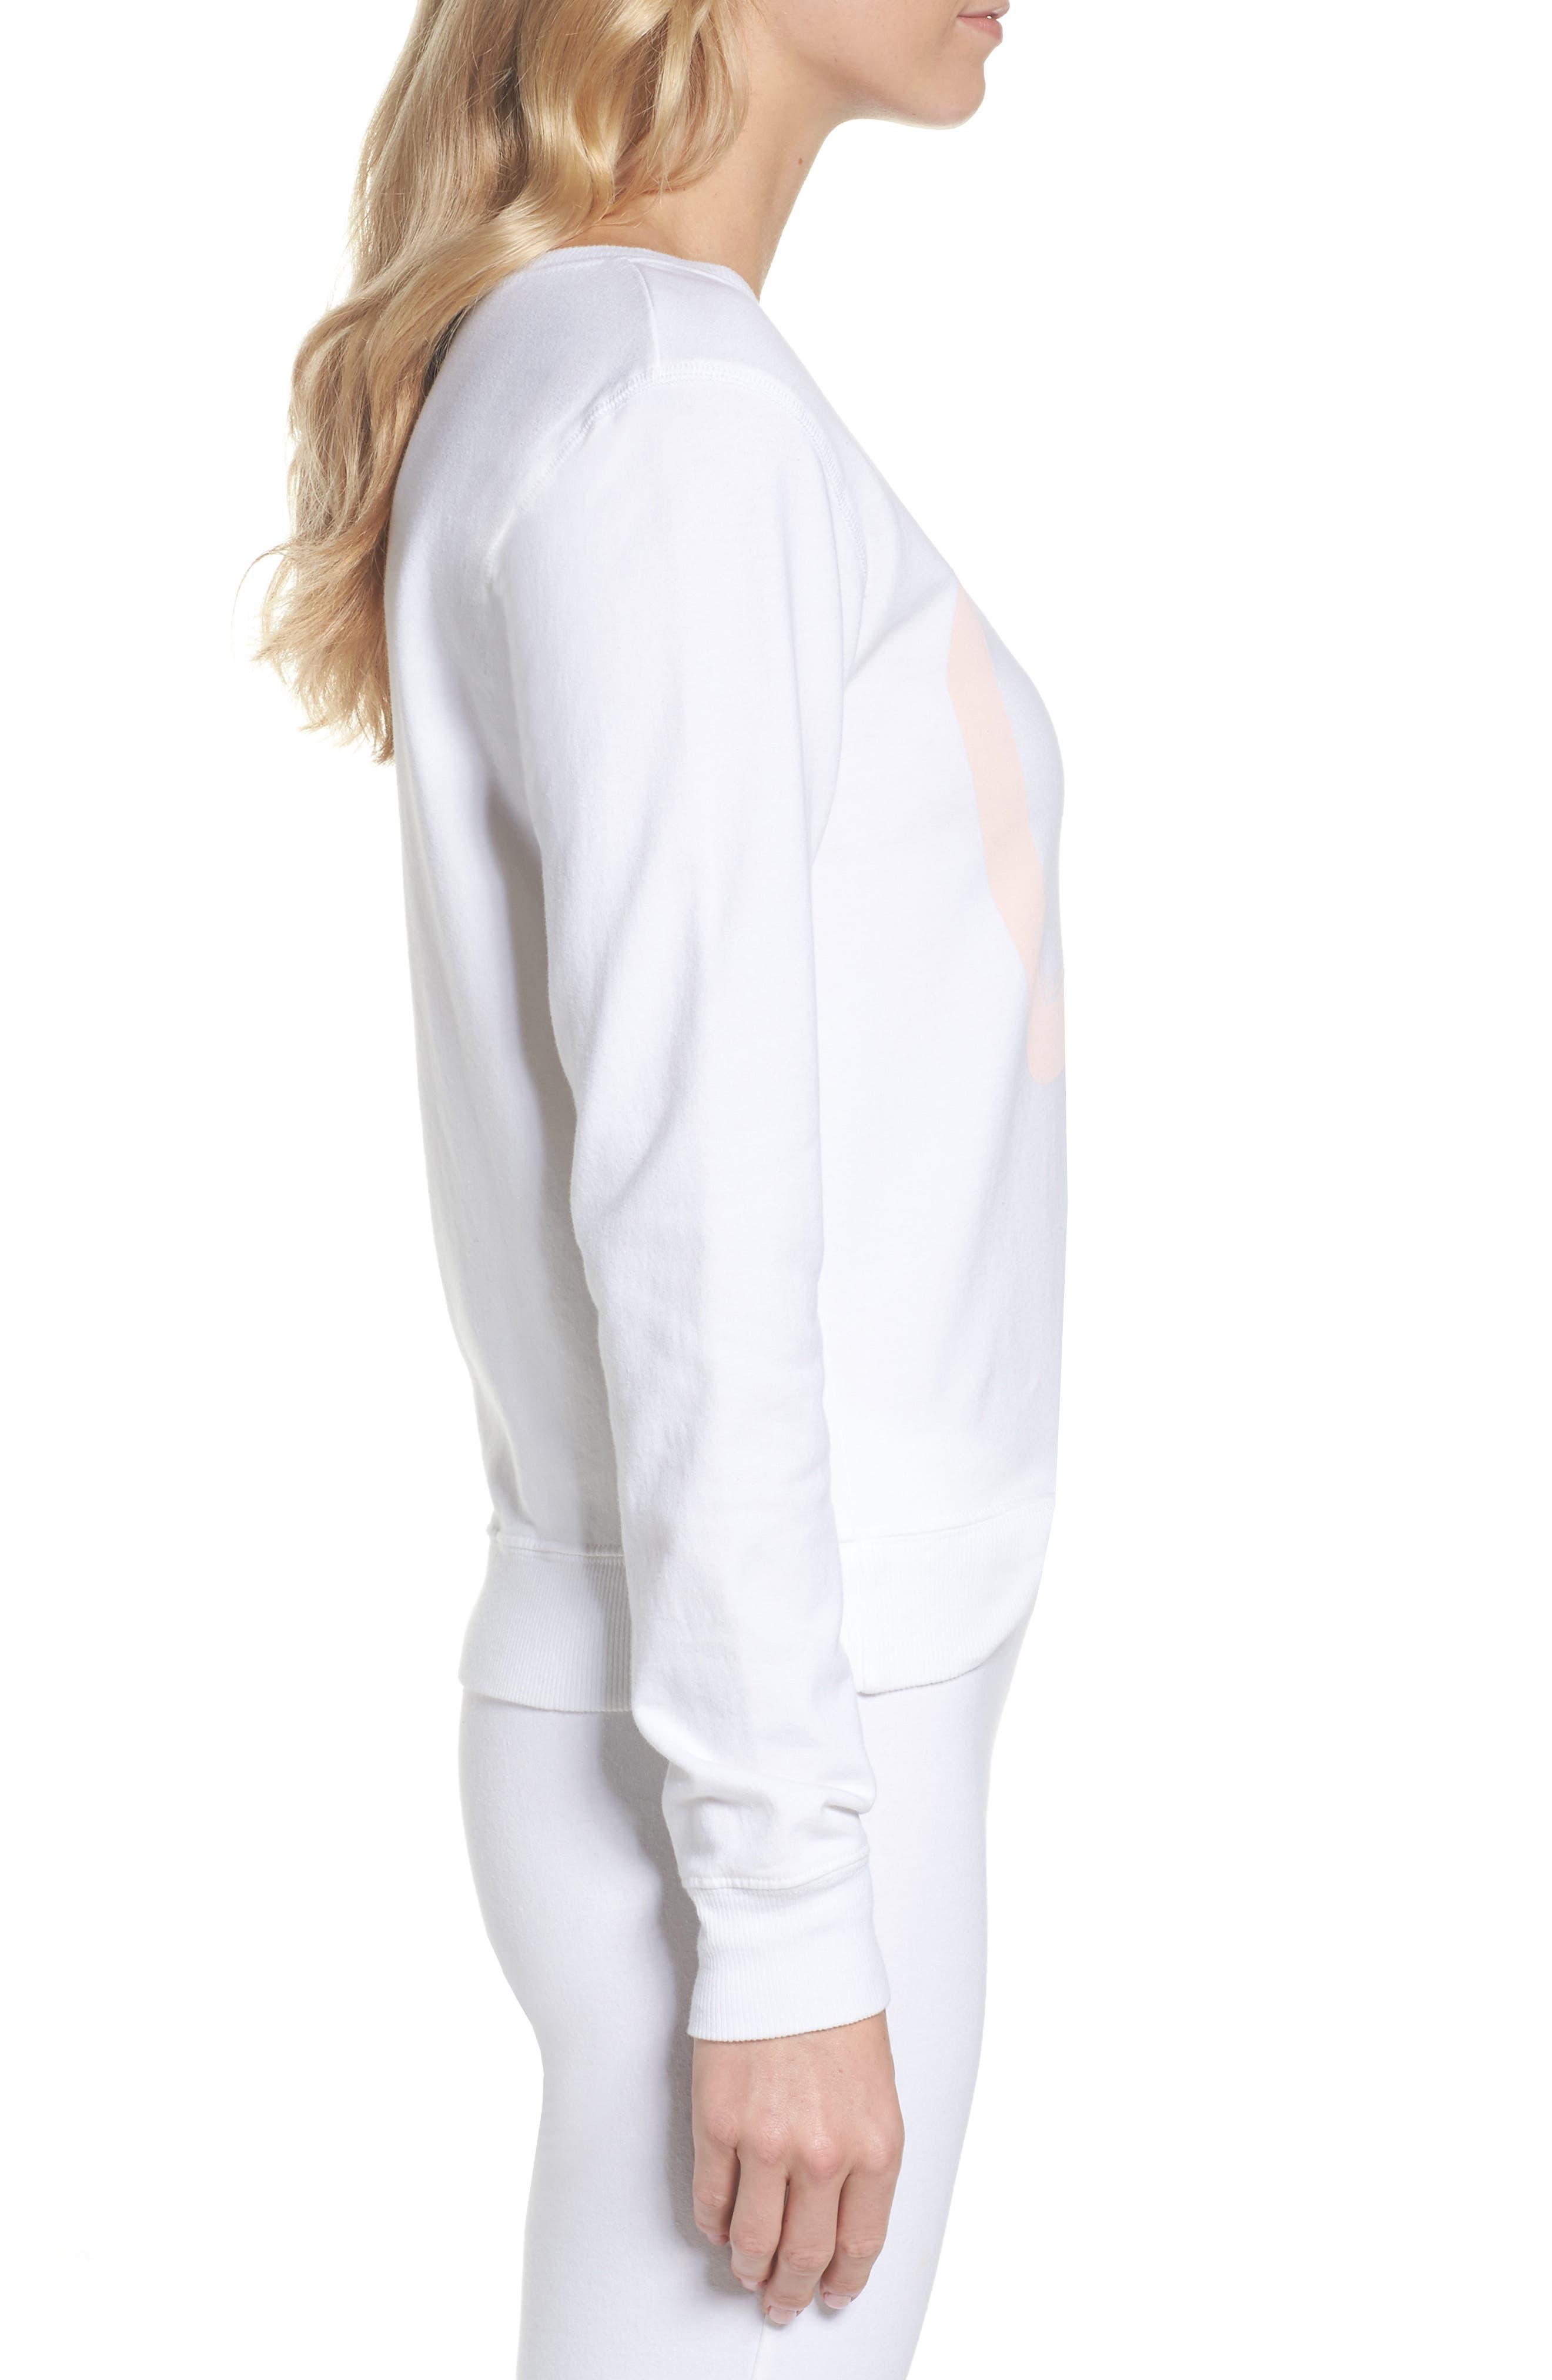 Lordes Fuzzy Fleece Sweatshirt,                             Alternate thumbnail 3, color,                             100